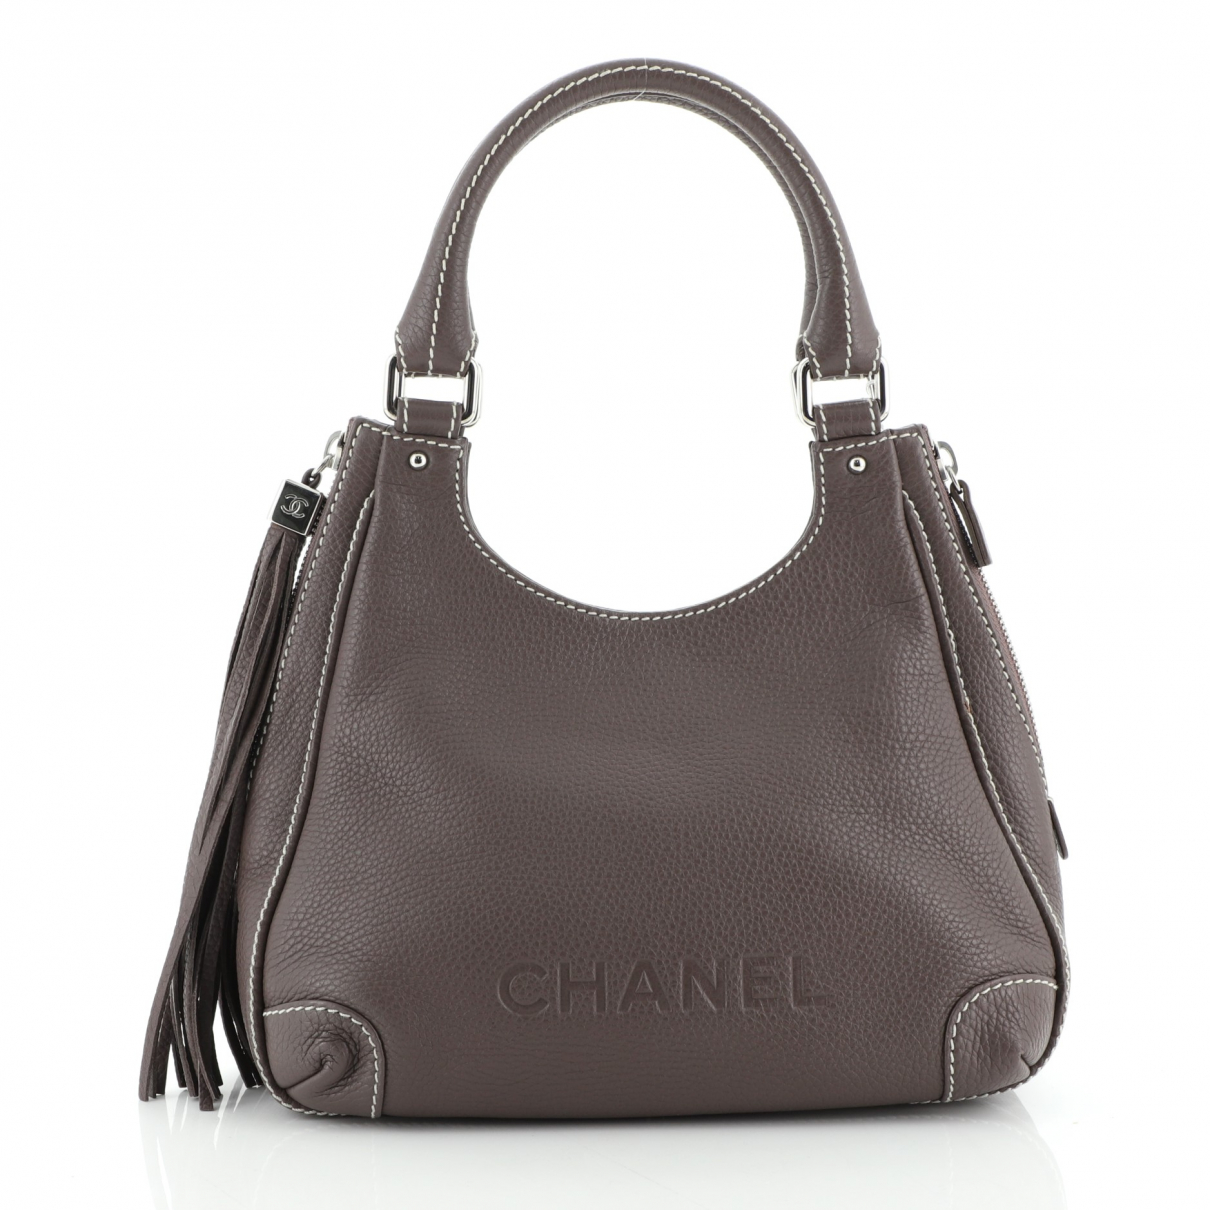 Chanel \N Brown Leather handbag for Women \N